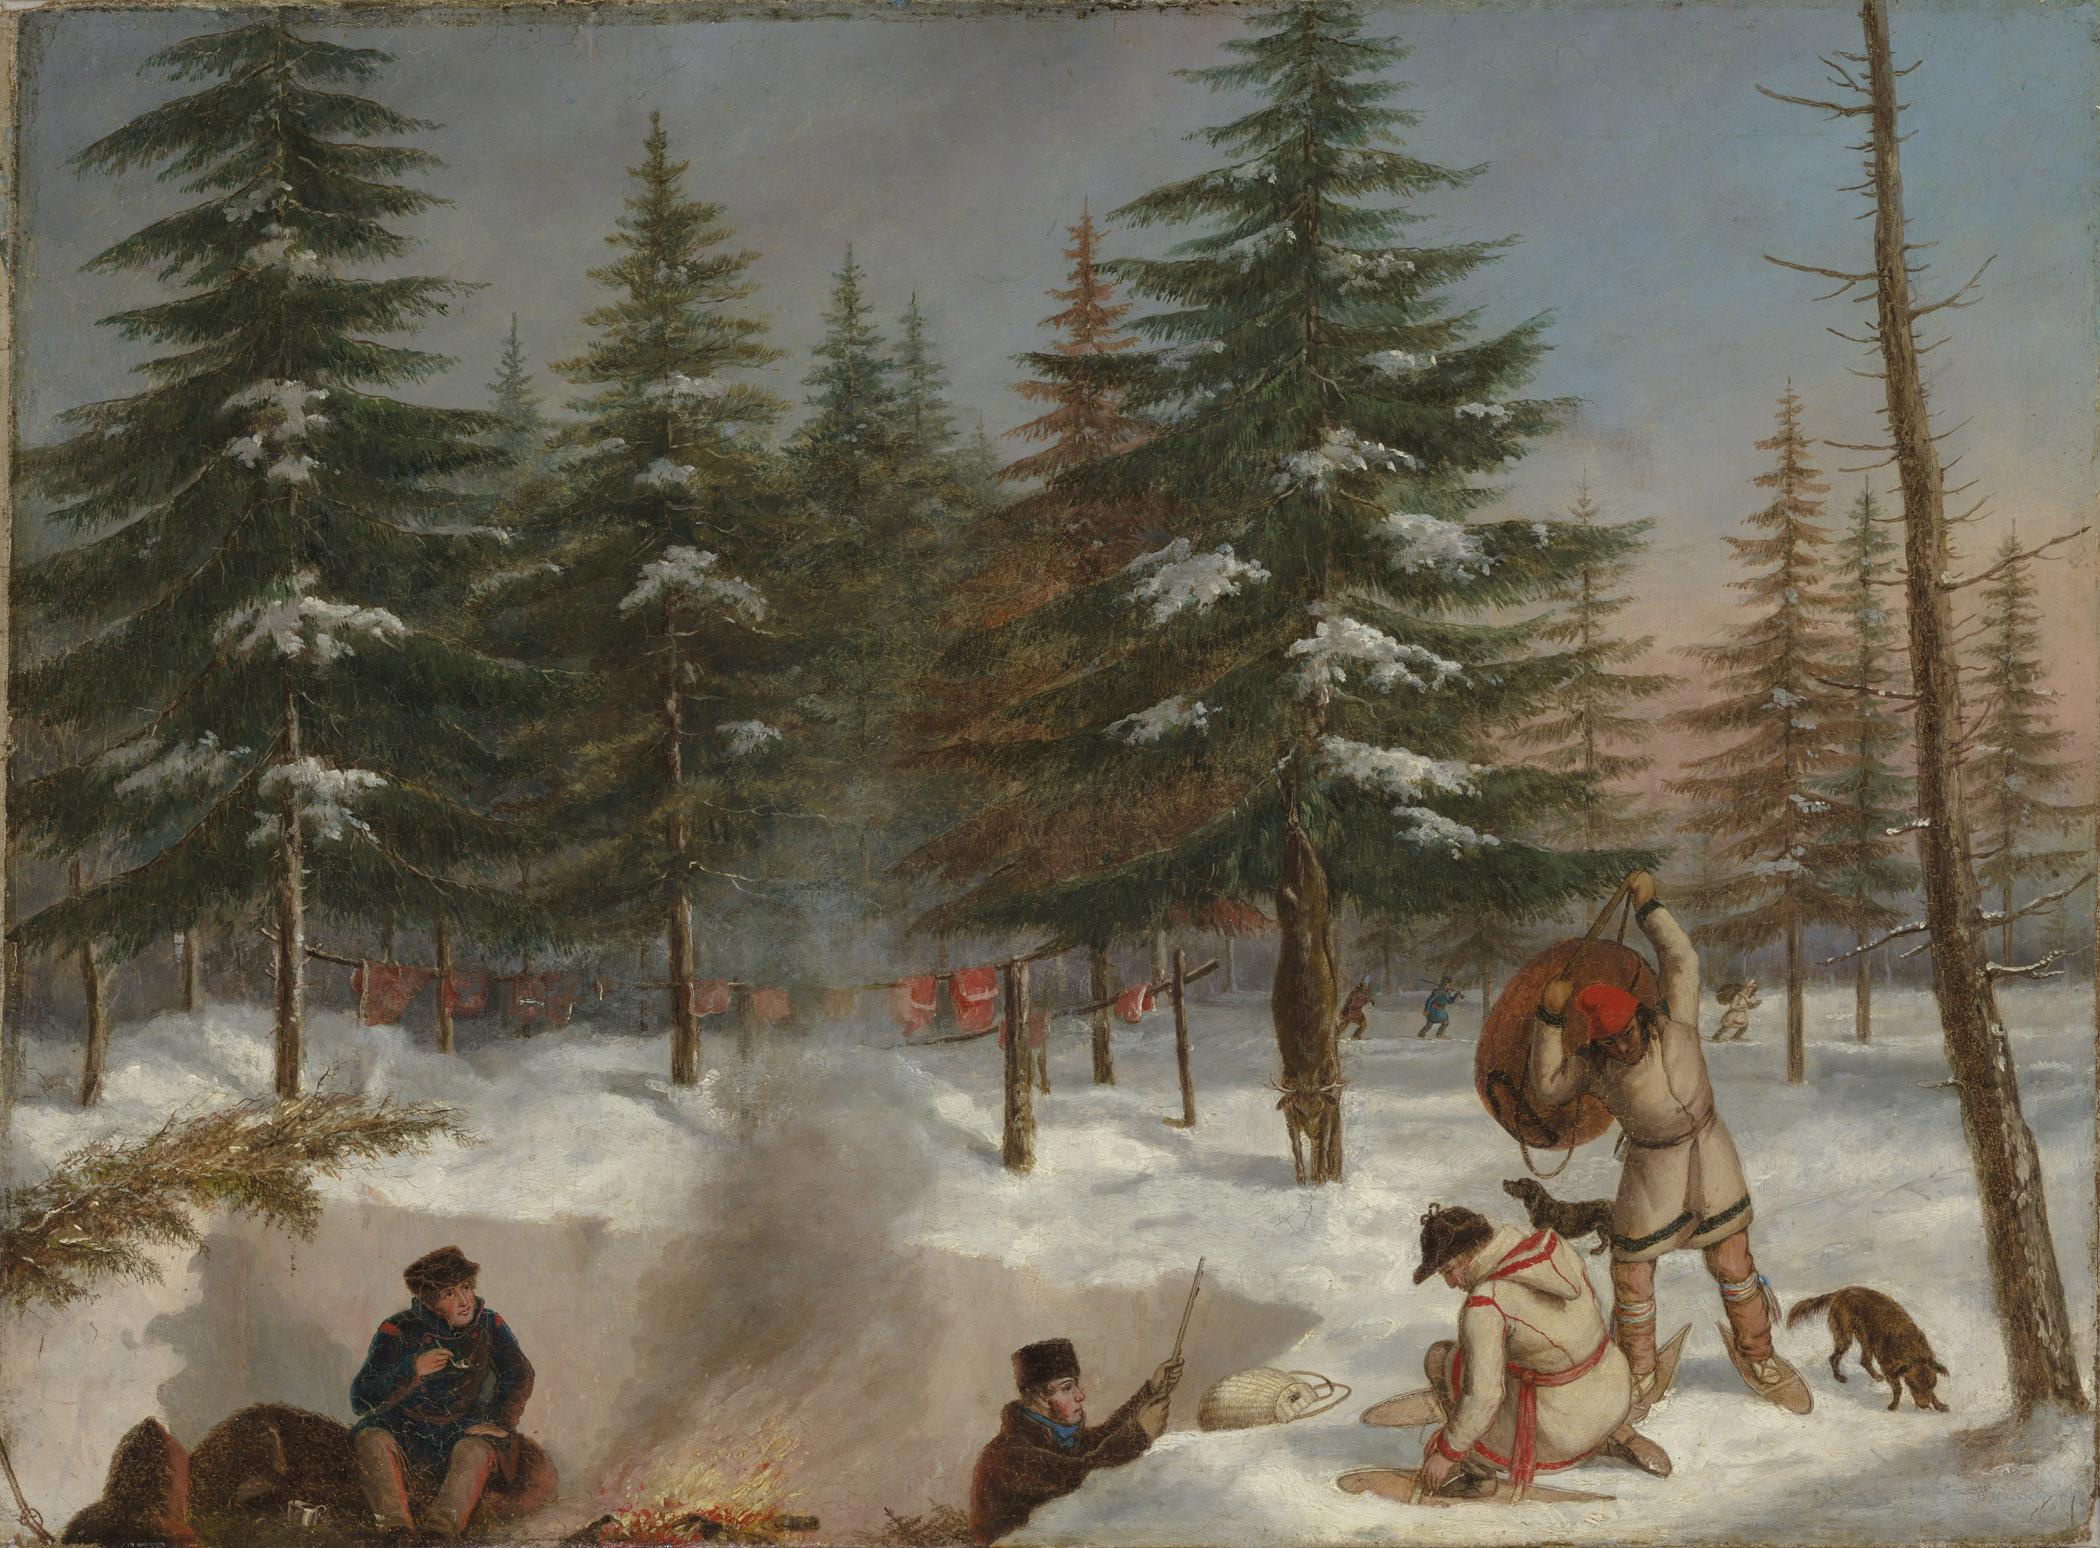 Cornelius Krieghoff, Camp de chasse, en hiver